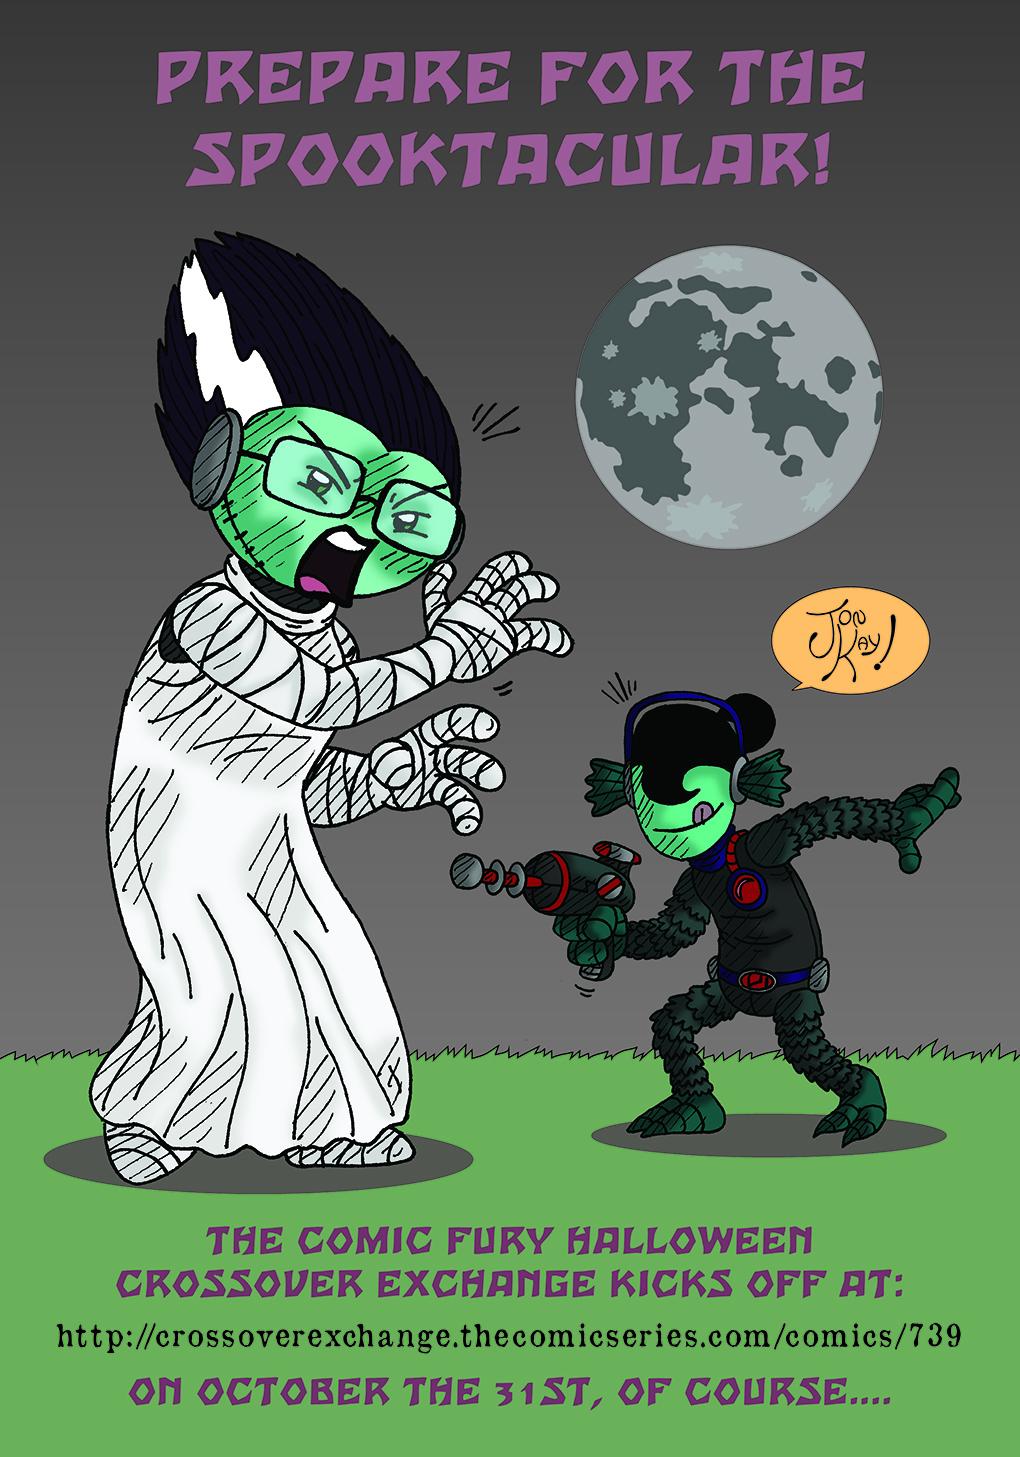 Halloween crossover promo!